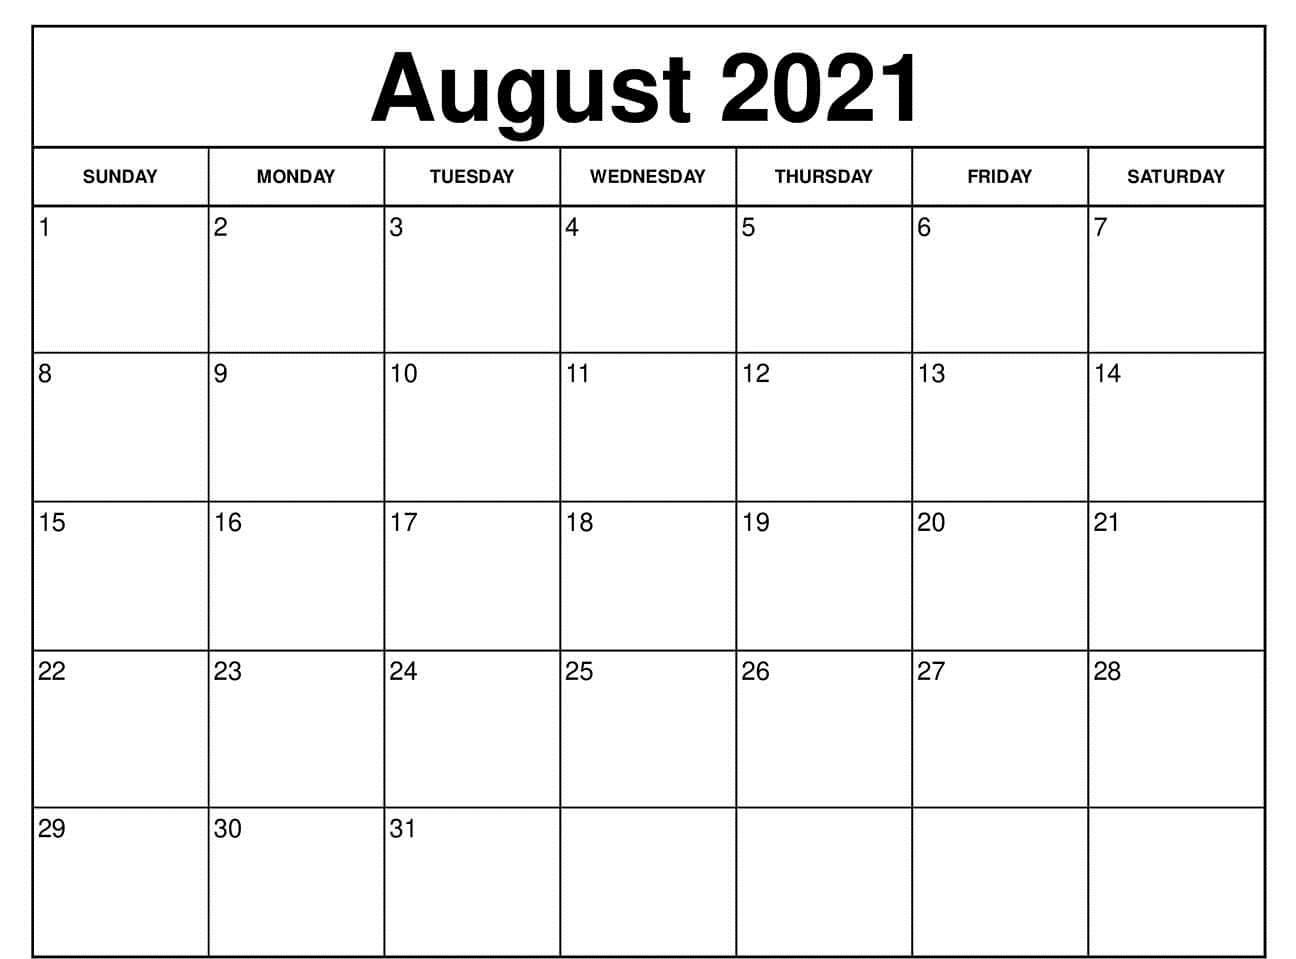 August 2021 Calendar Printable with Holidays